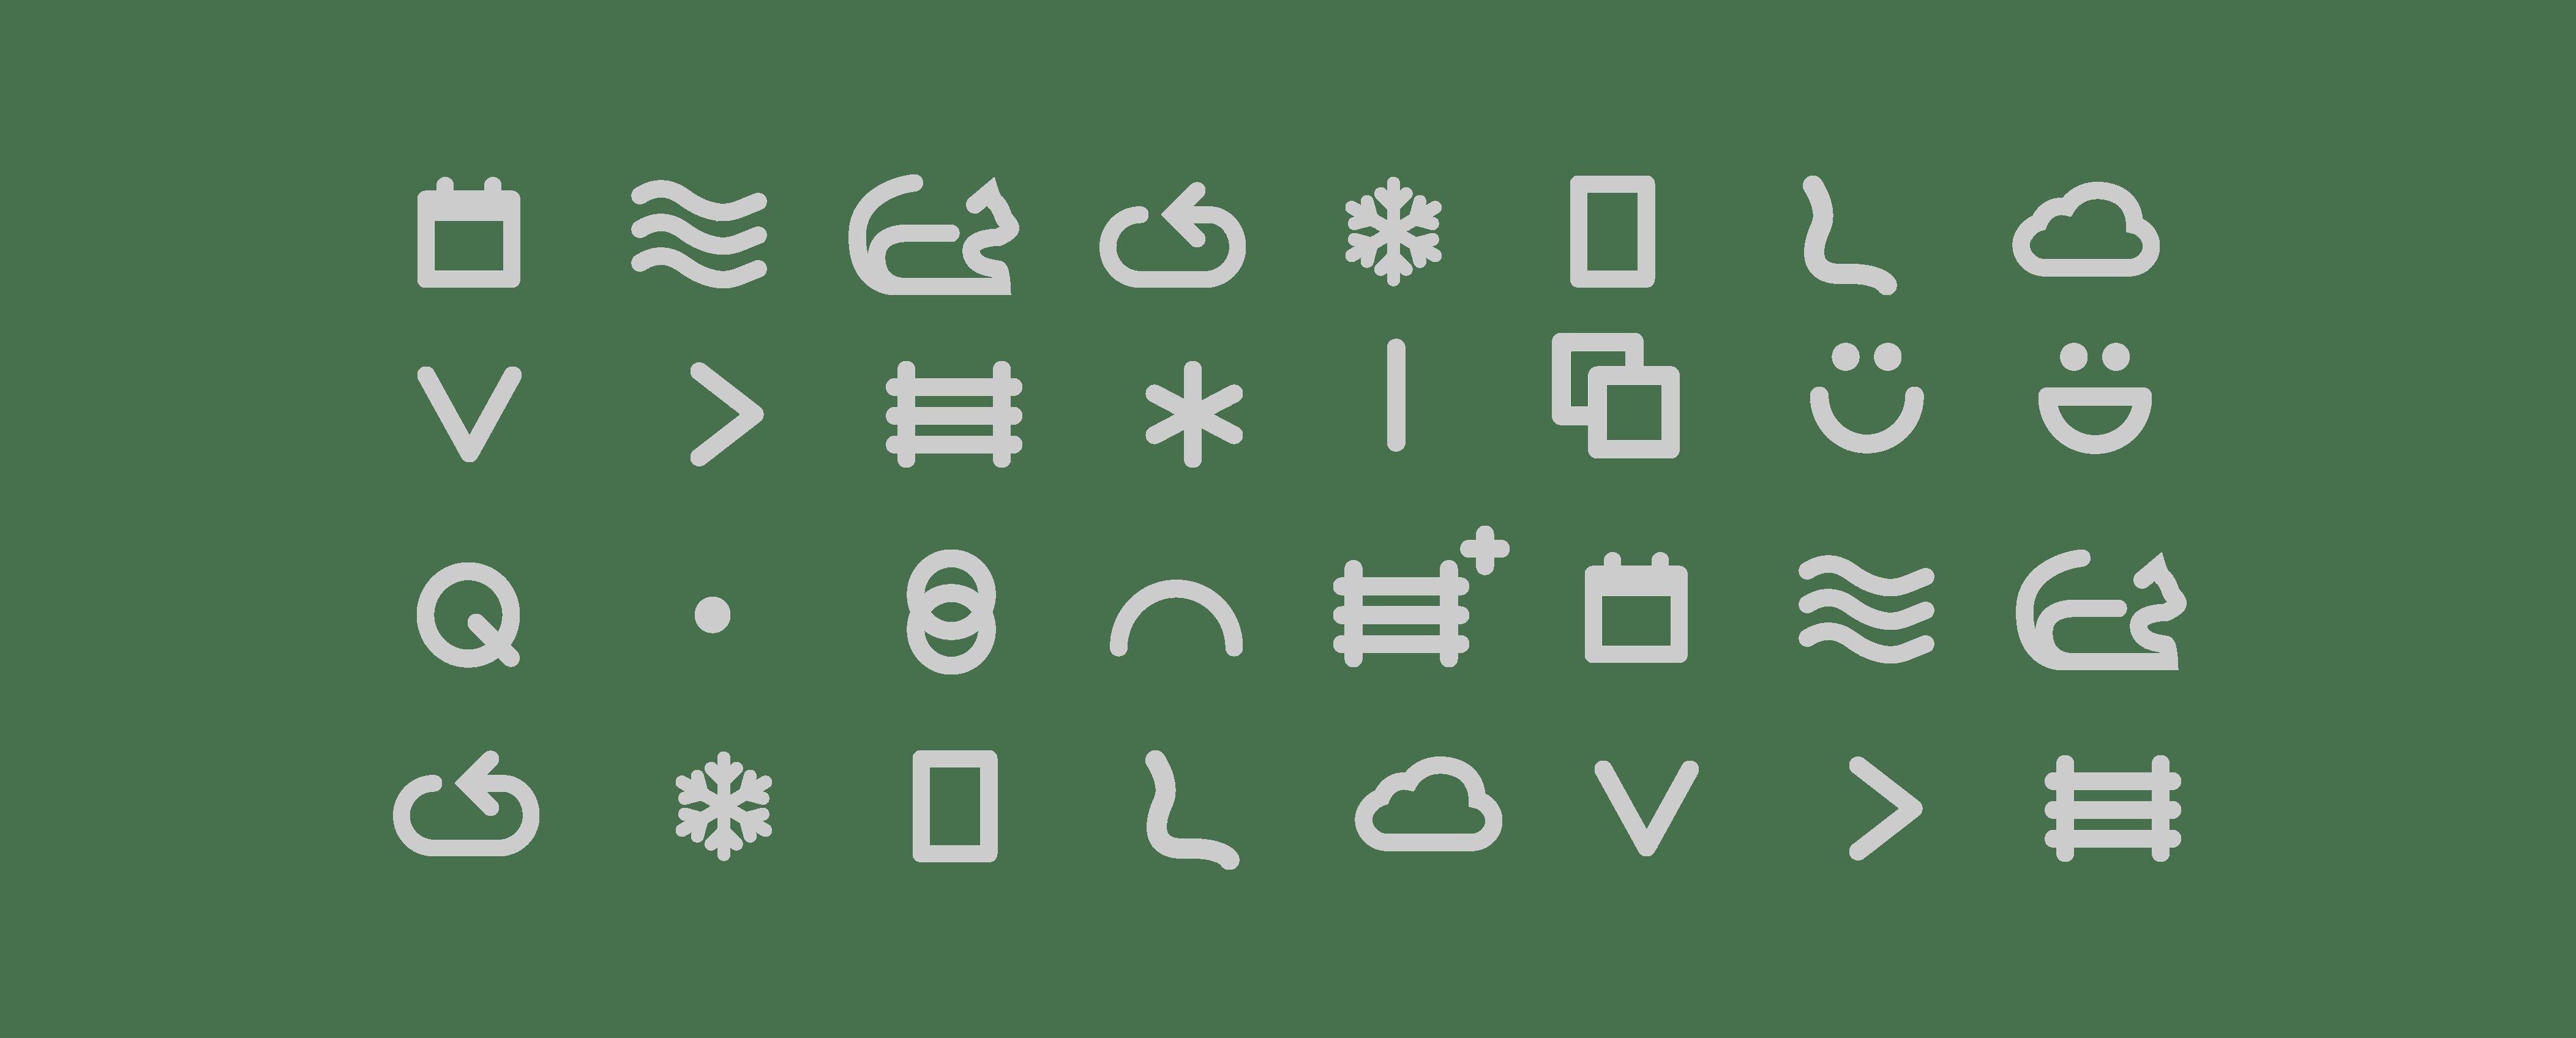 komac-icons